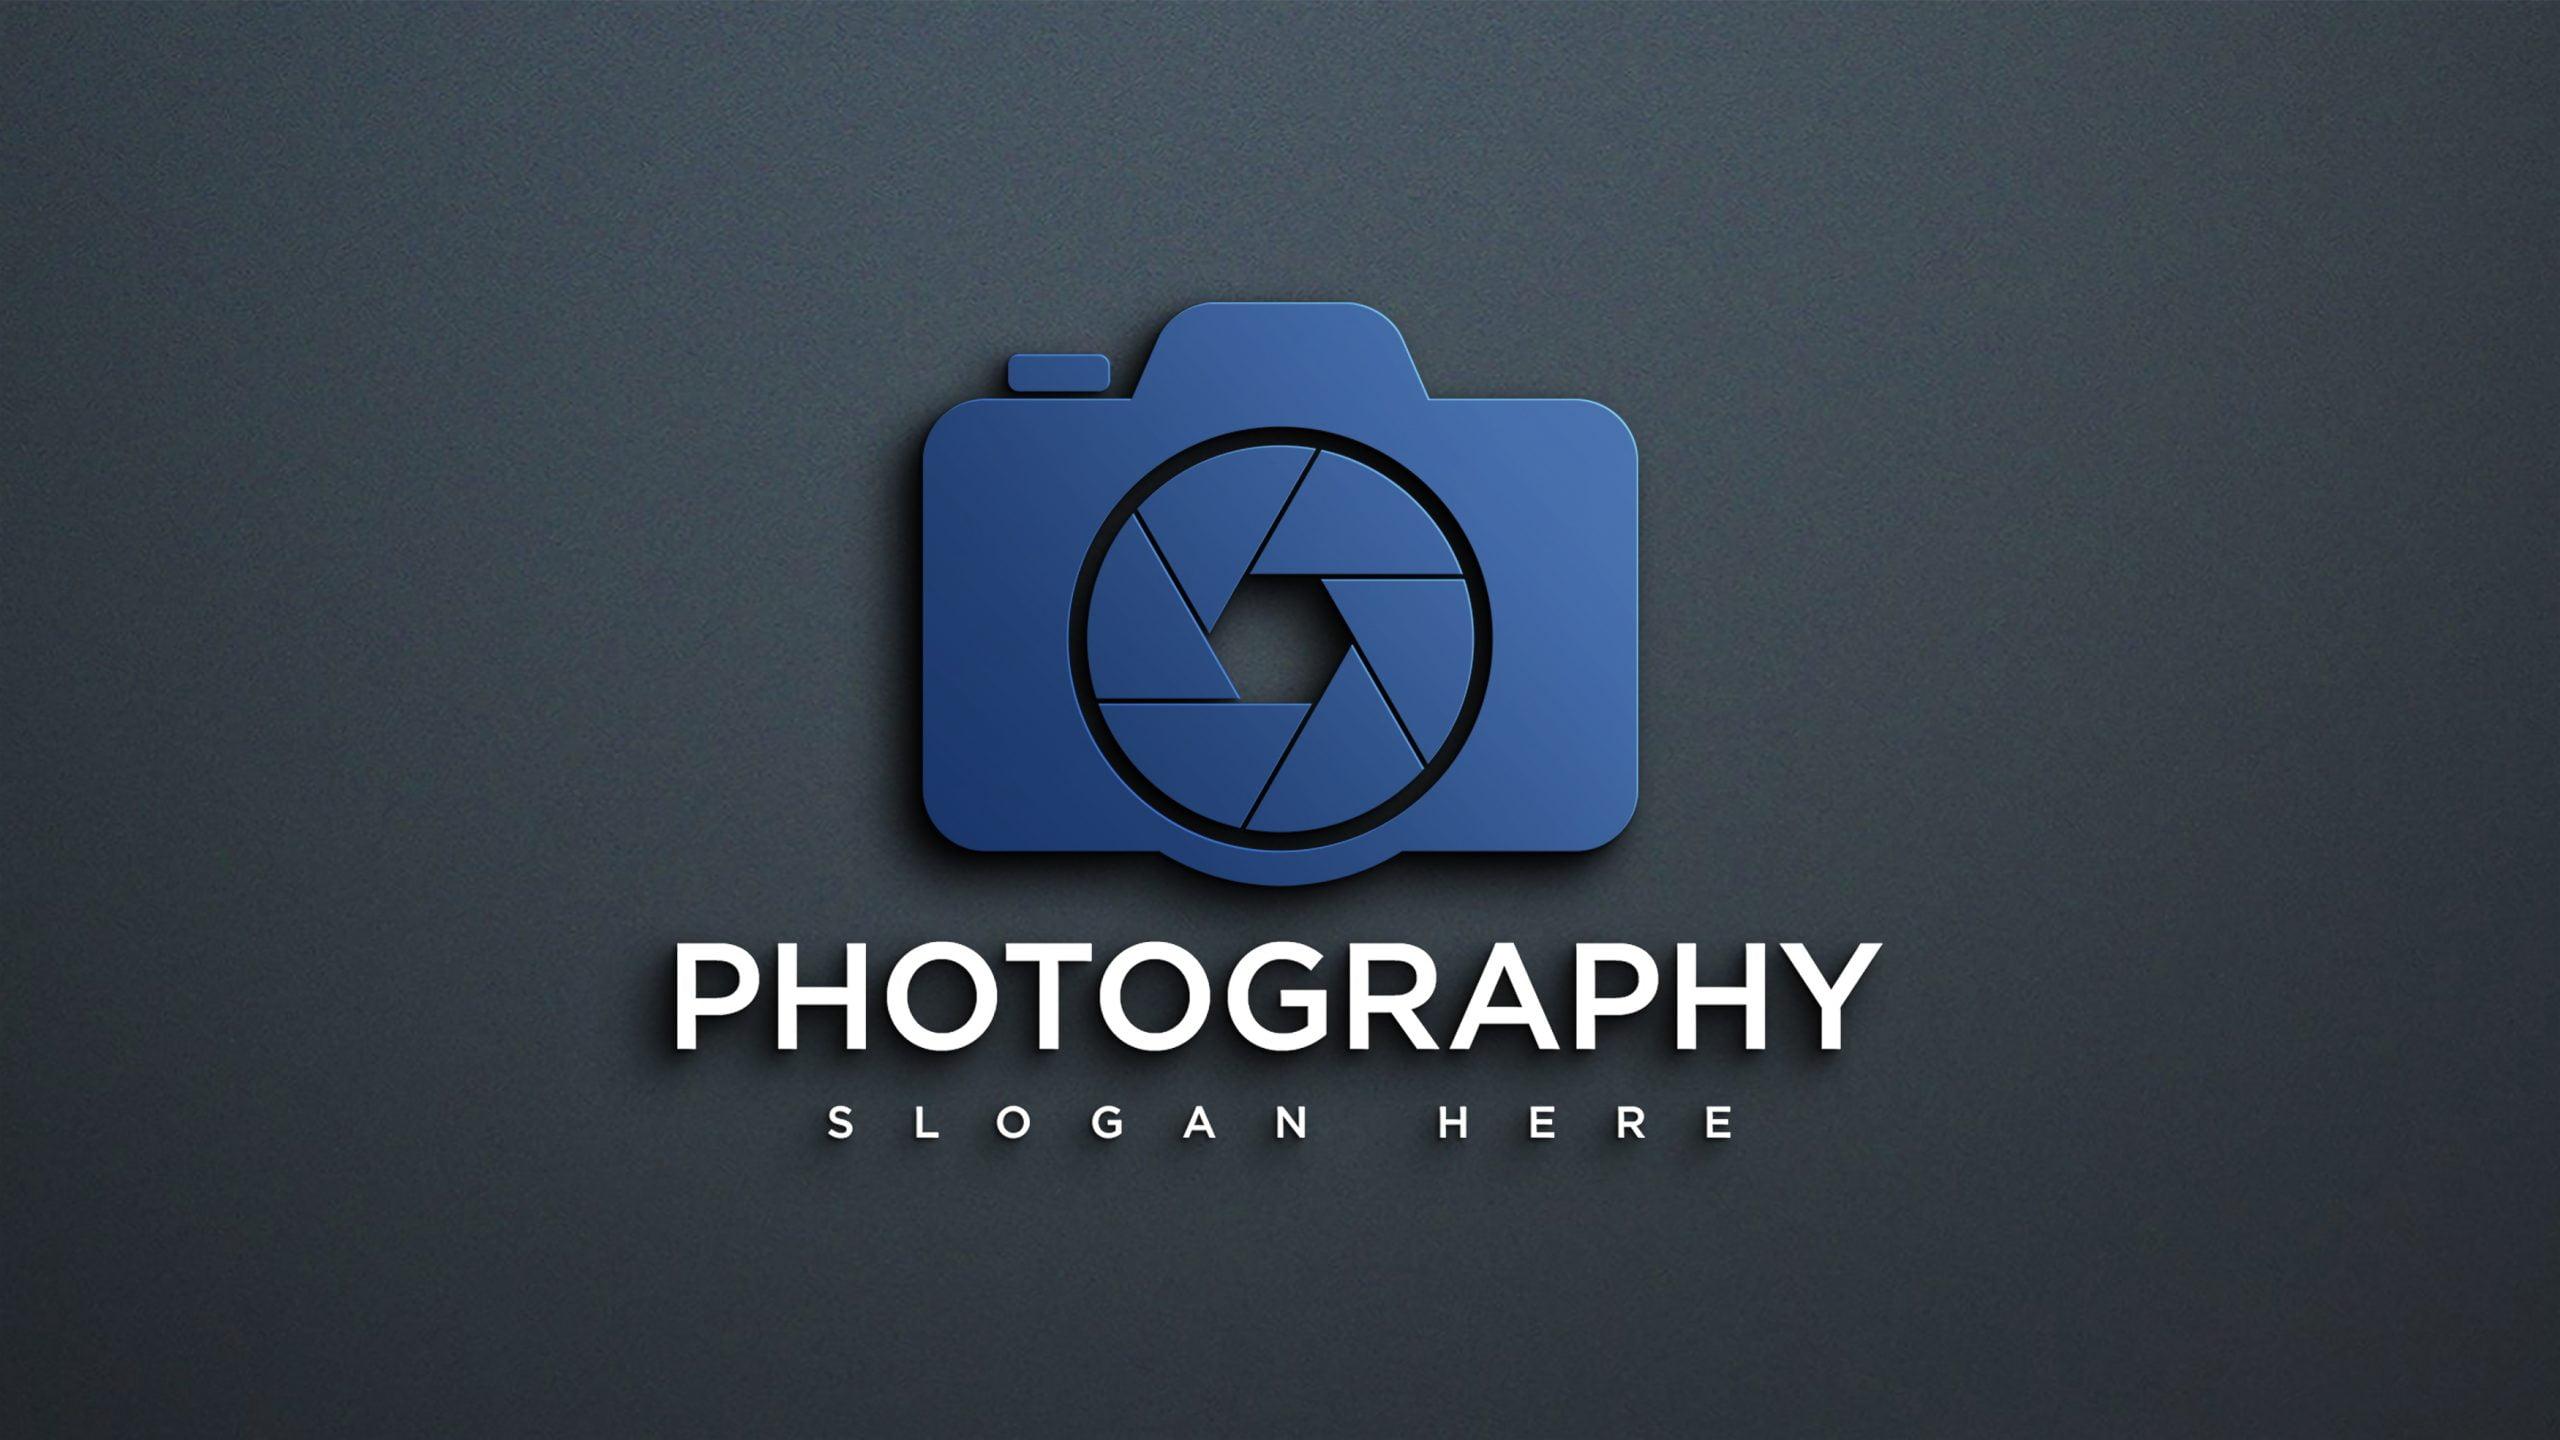 Free Photography Logo Design Template